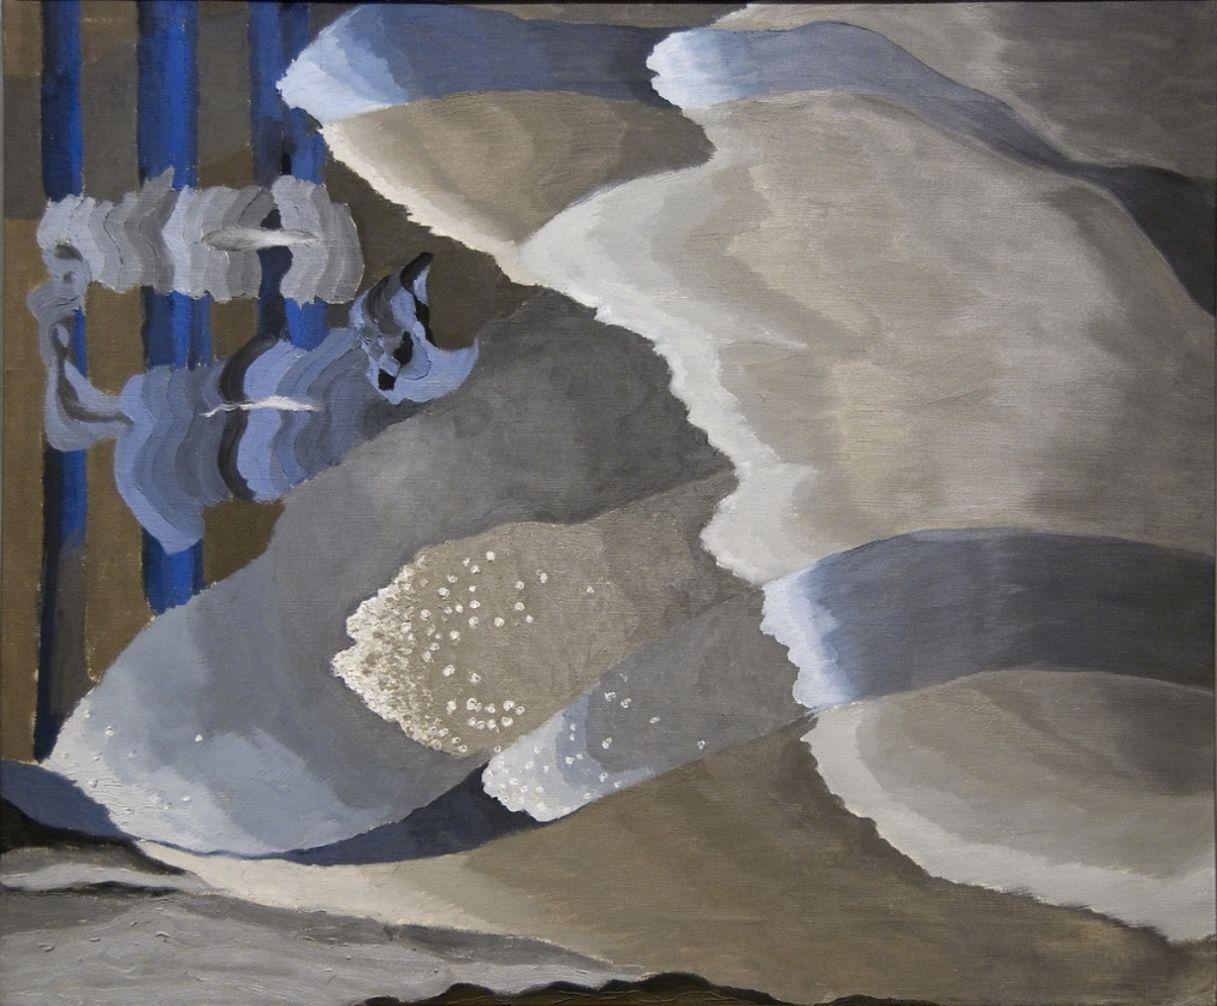 Arthur Dove(USA) アーサー・ダヴ(米) | Arthur dove, Art, Vintage ...